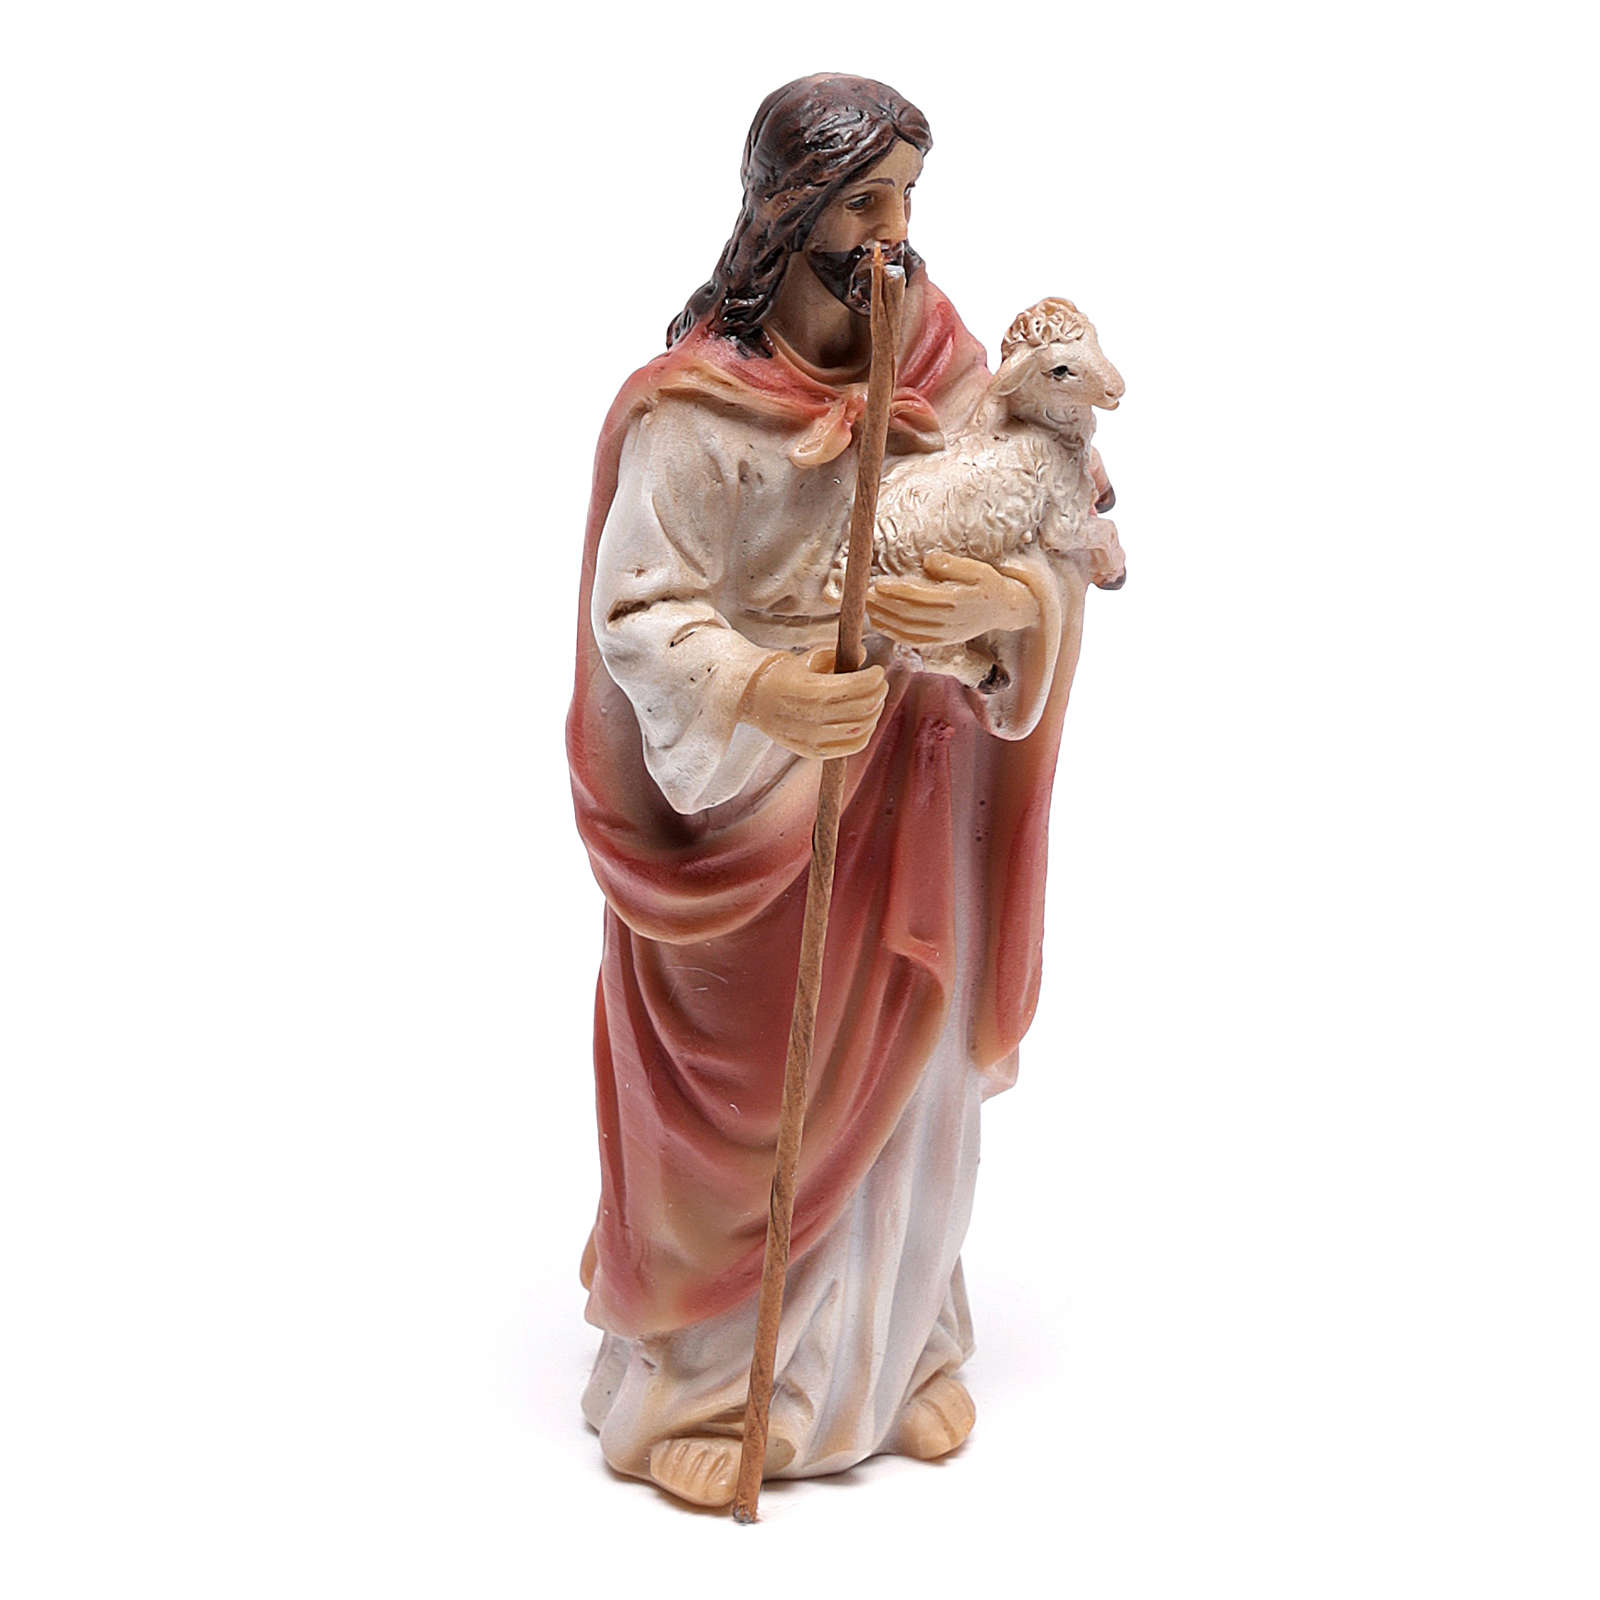 Statuette of Jesus the Good Shepherd 9 cm 4